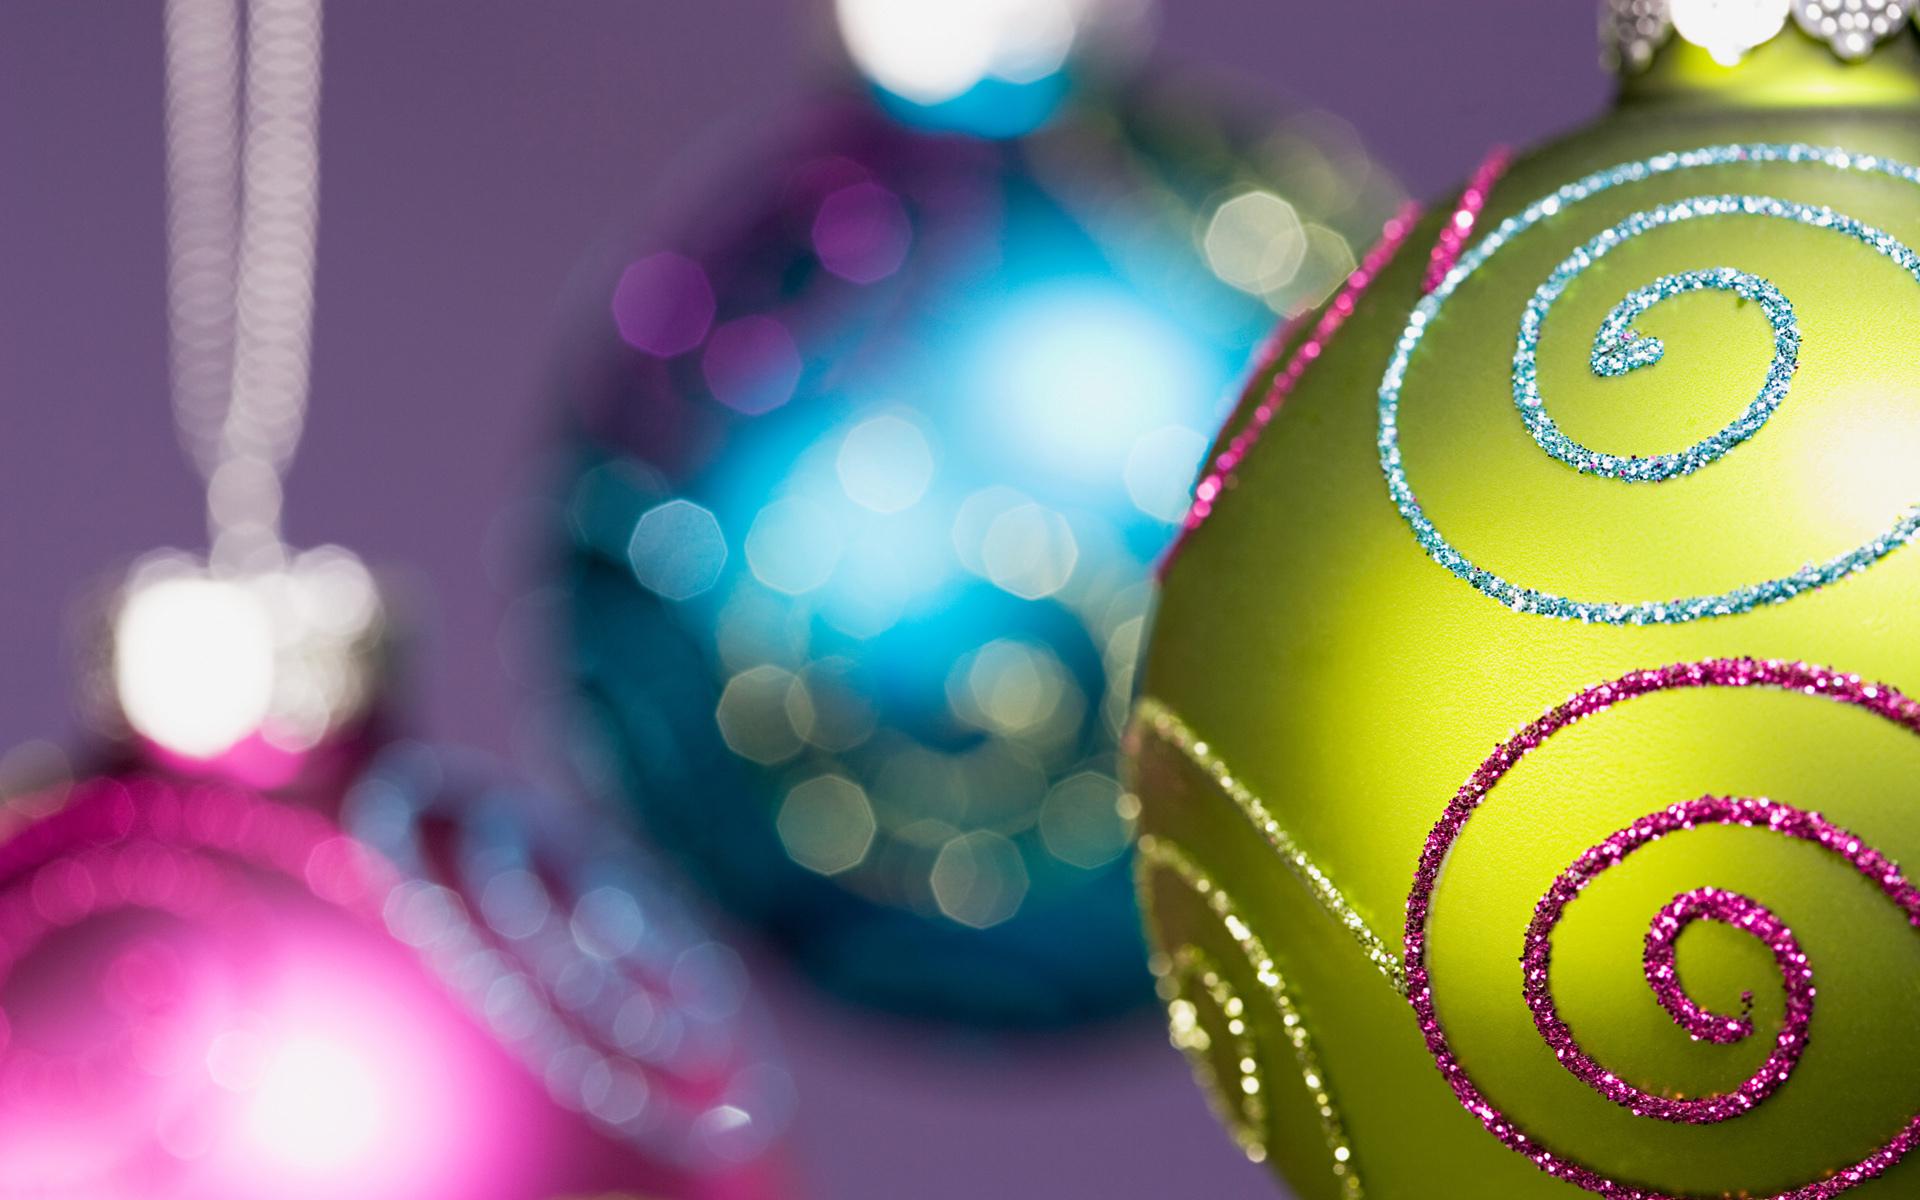 christmas balls background - photo #31